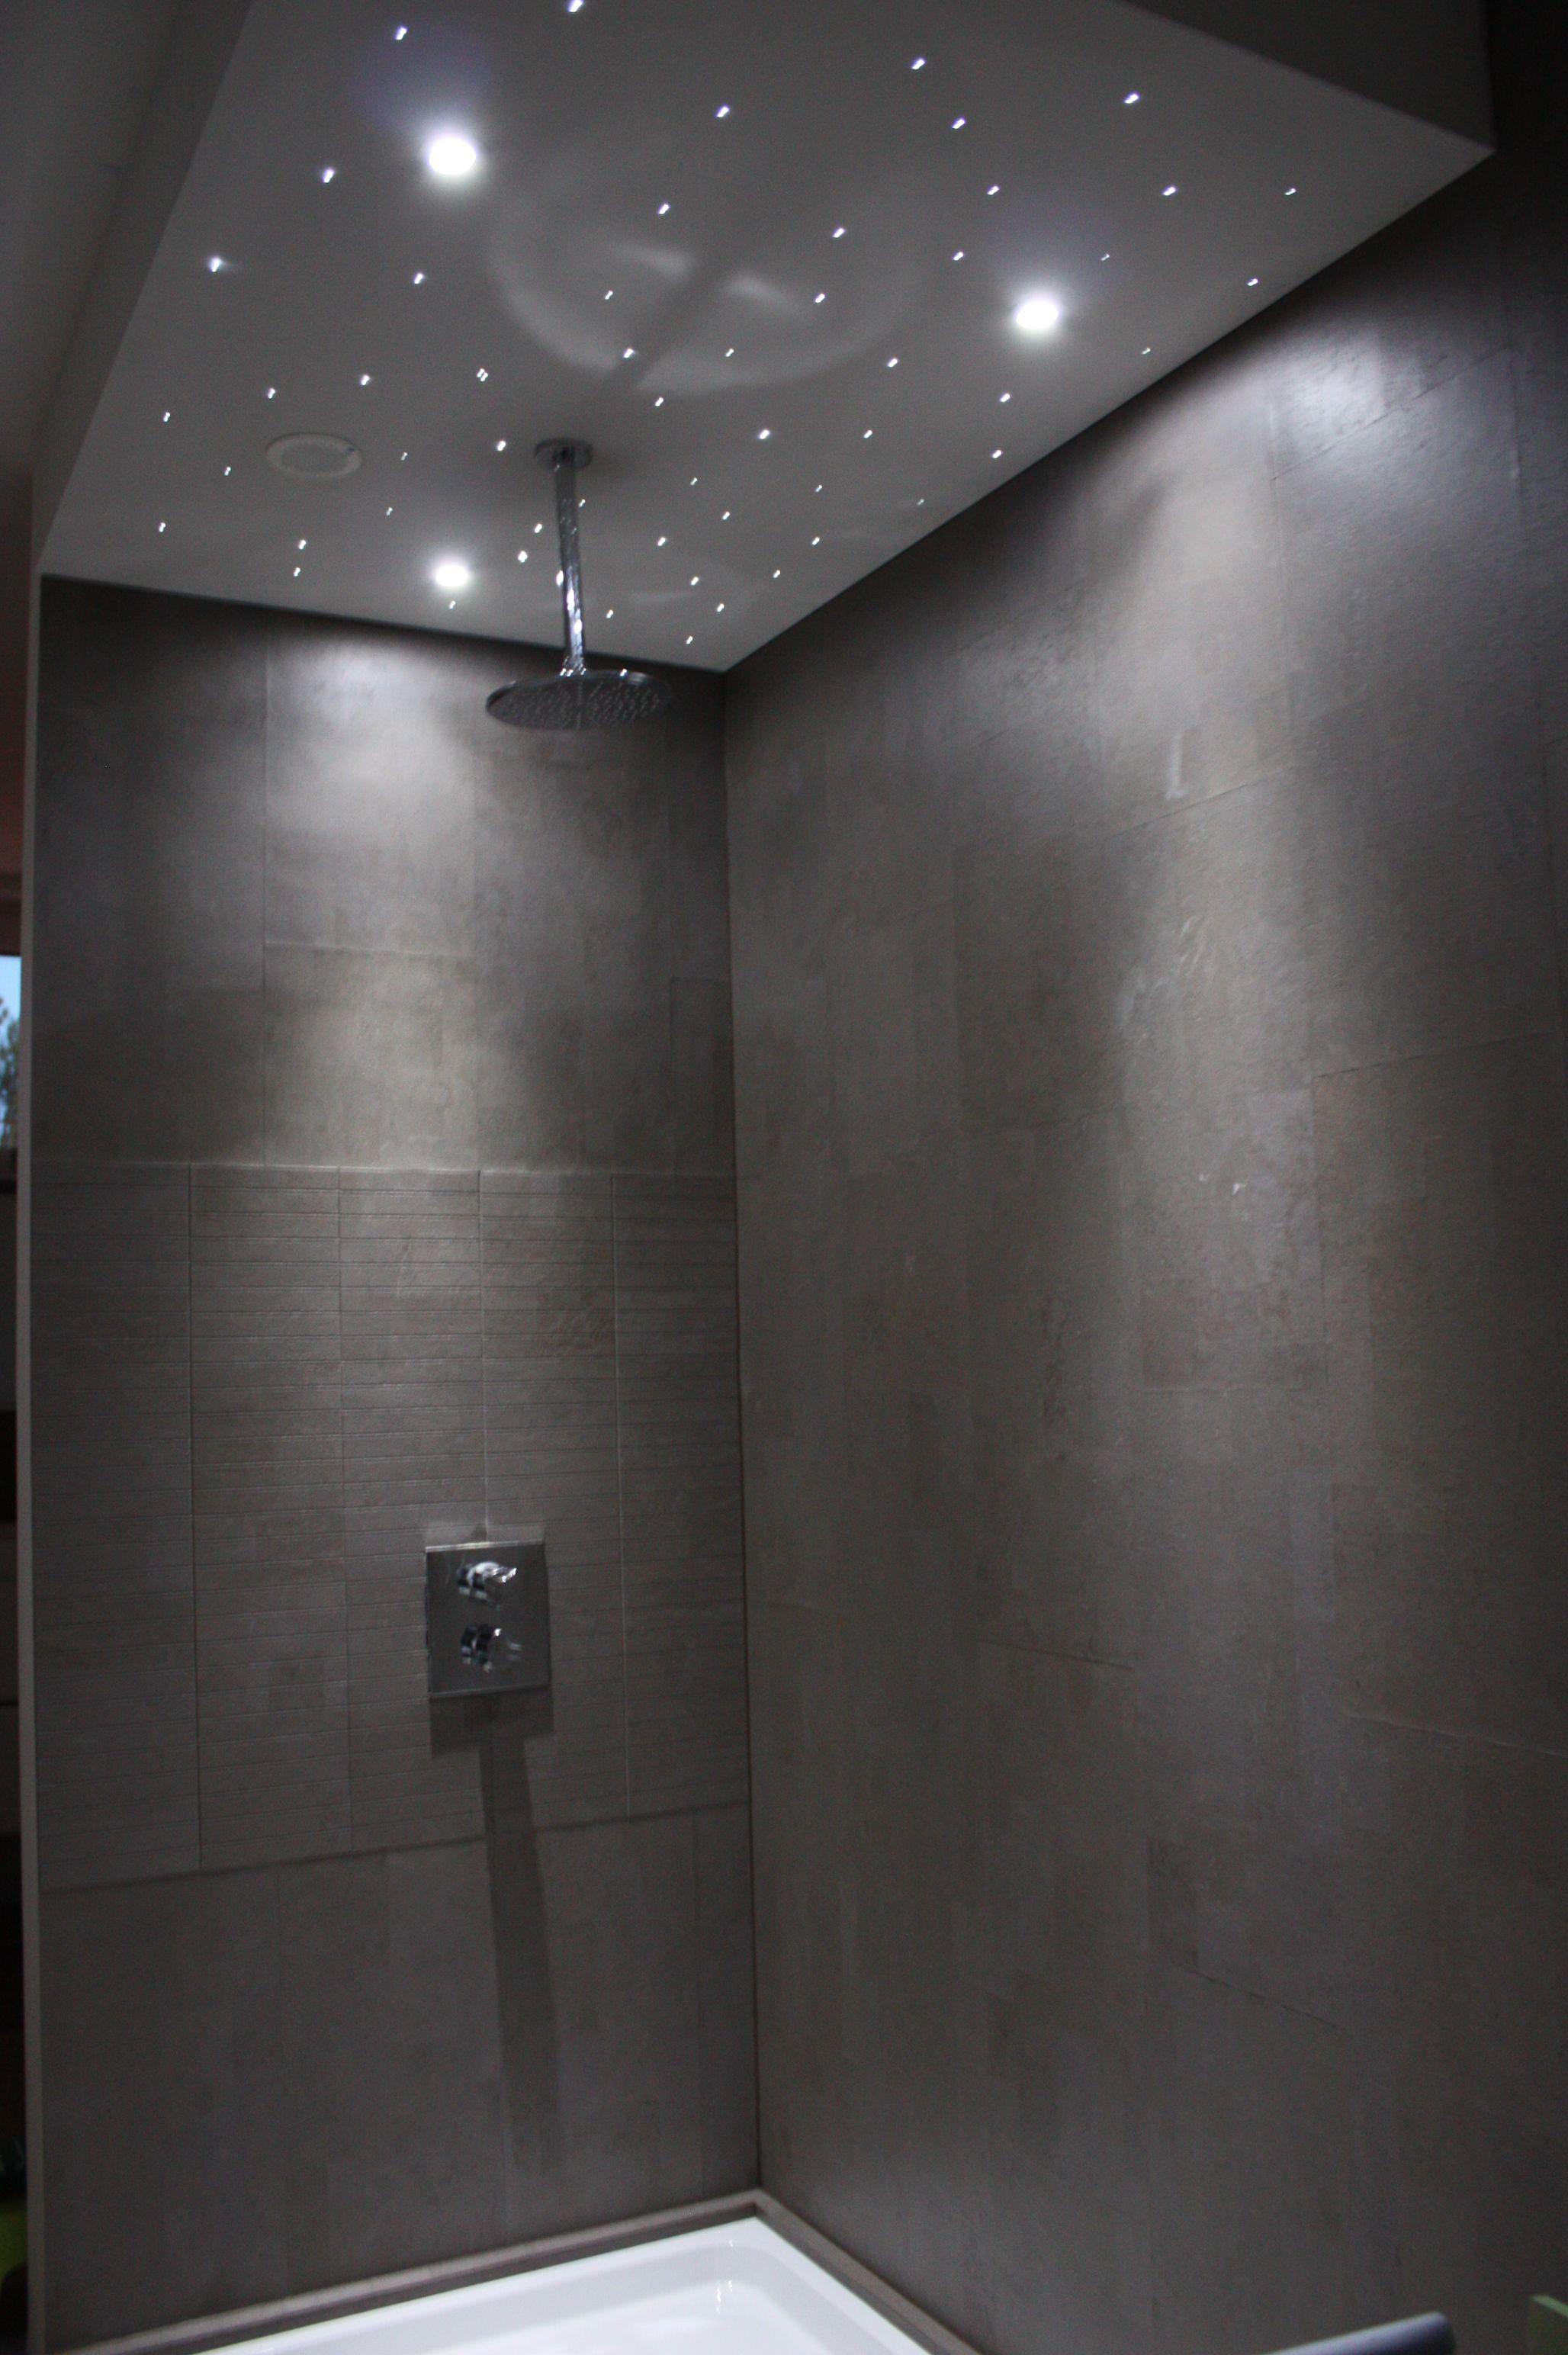 kurk in douche corkkurkkork pinterest badkamer zolderkamer